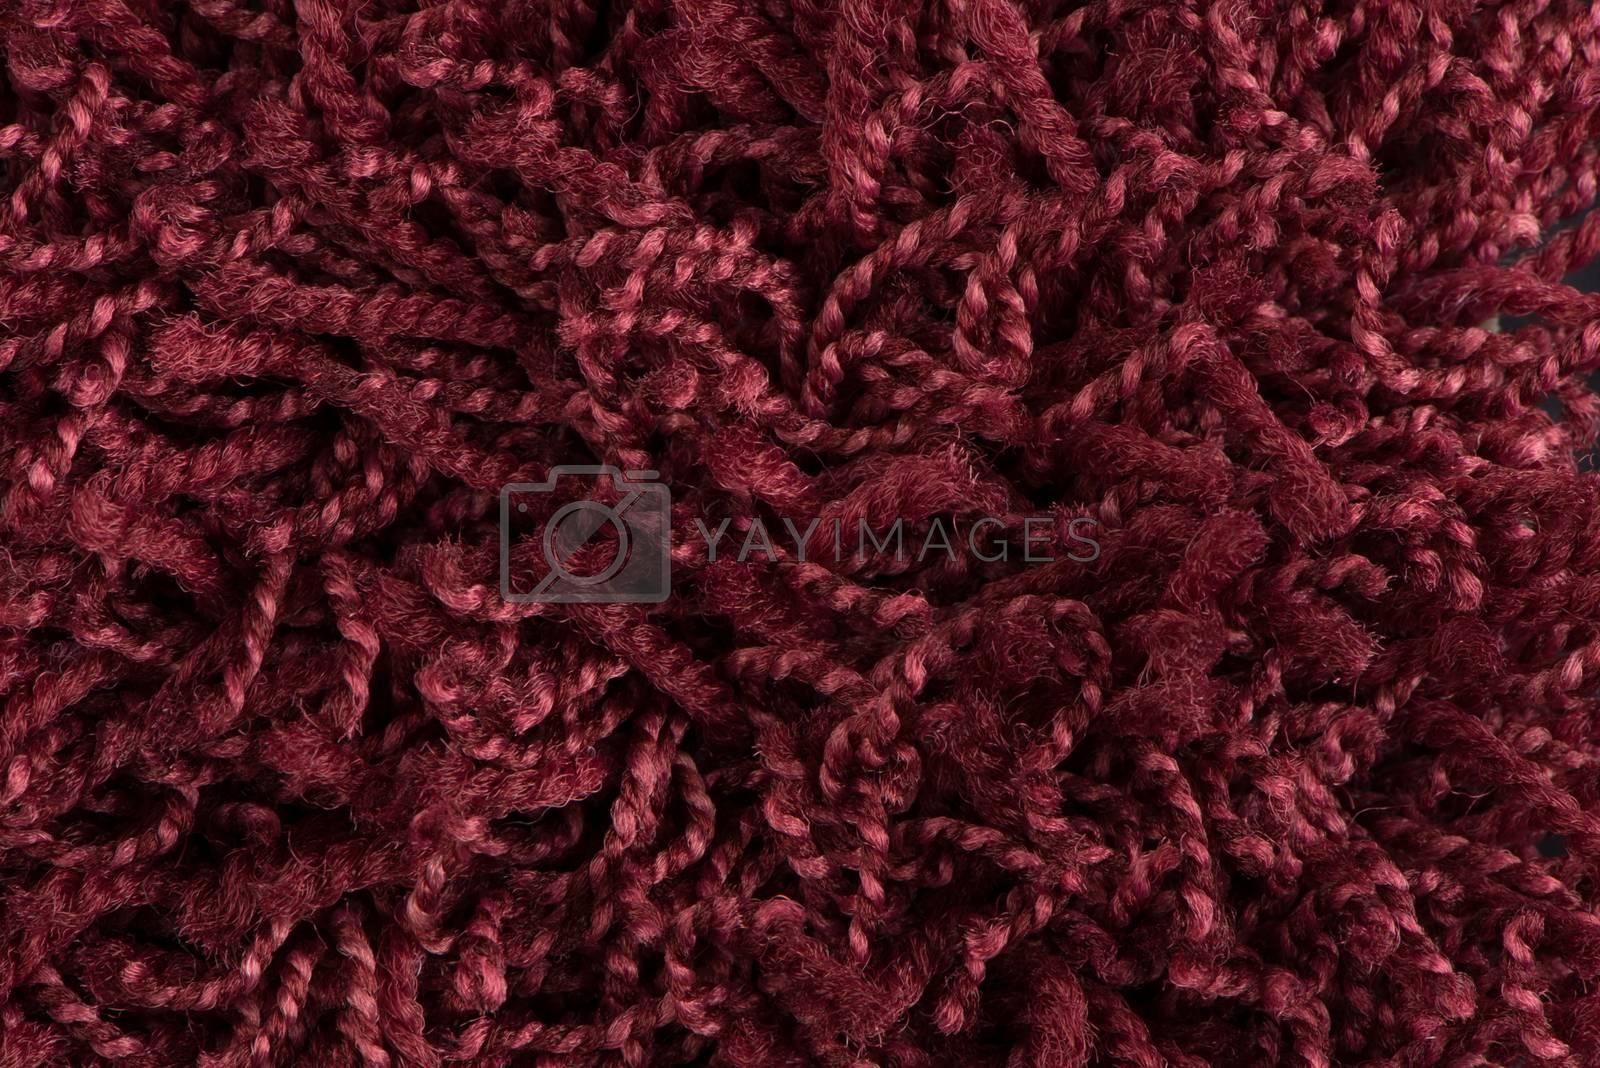 Royalty free image of Pink carpet by homydesign